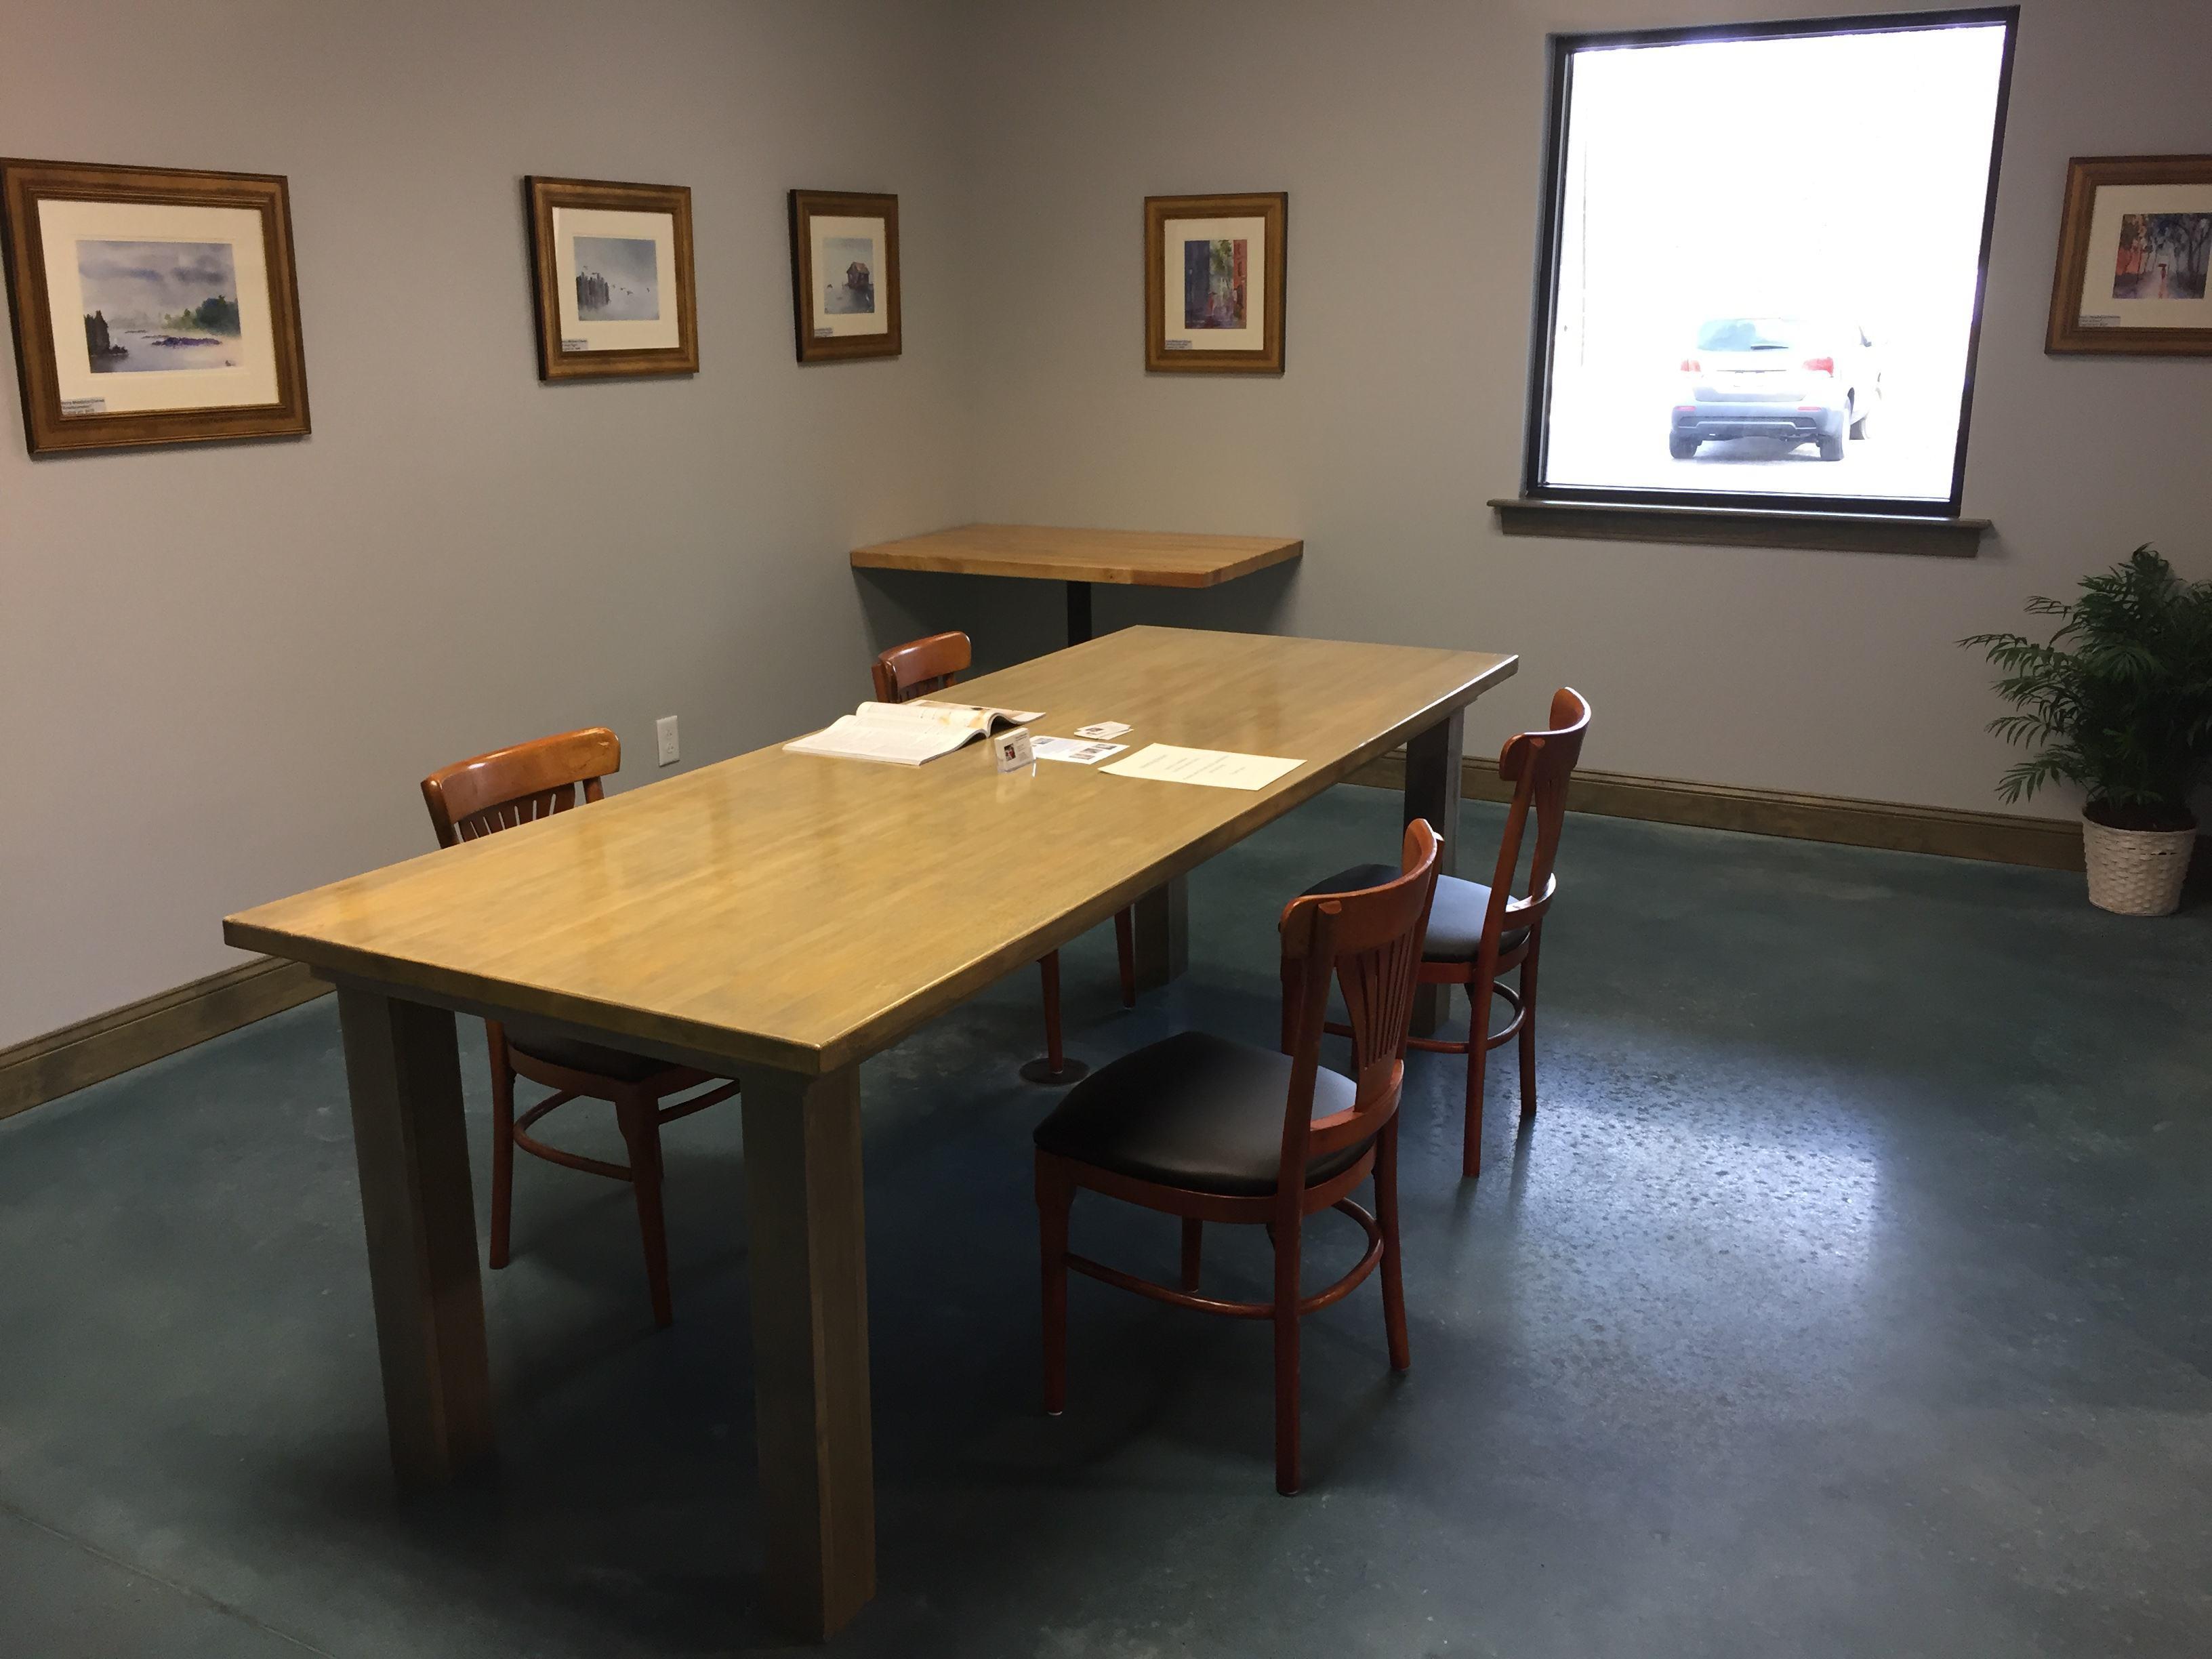 Lowco Cafe - Meeting Room 1